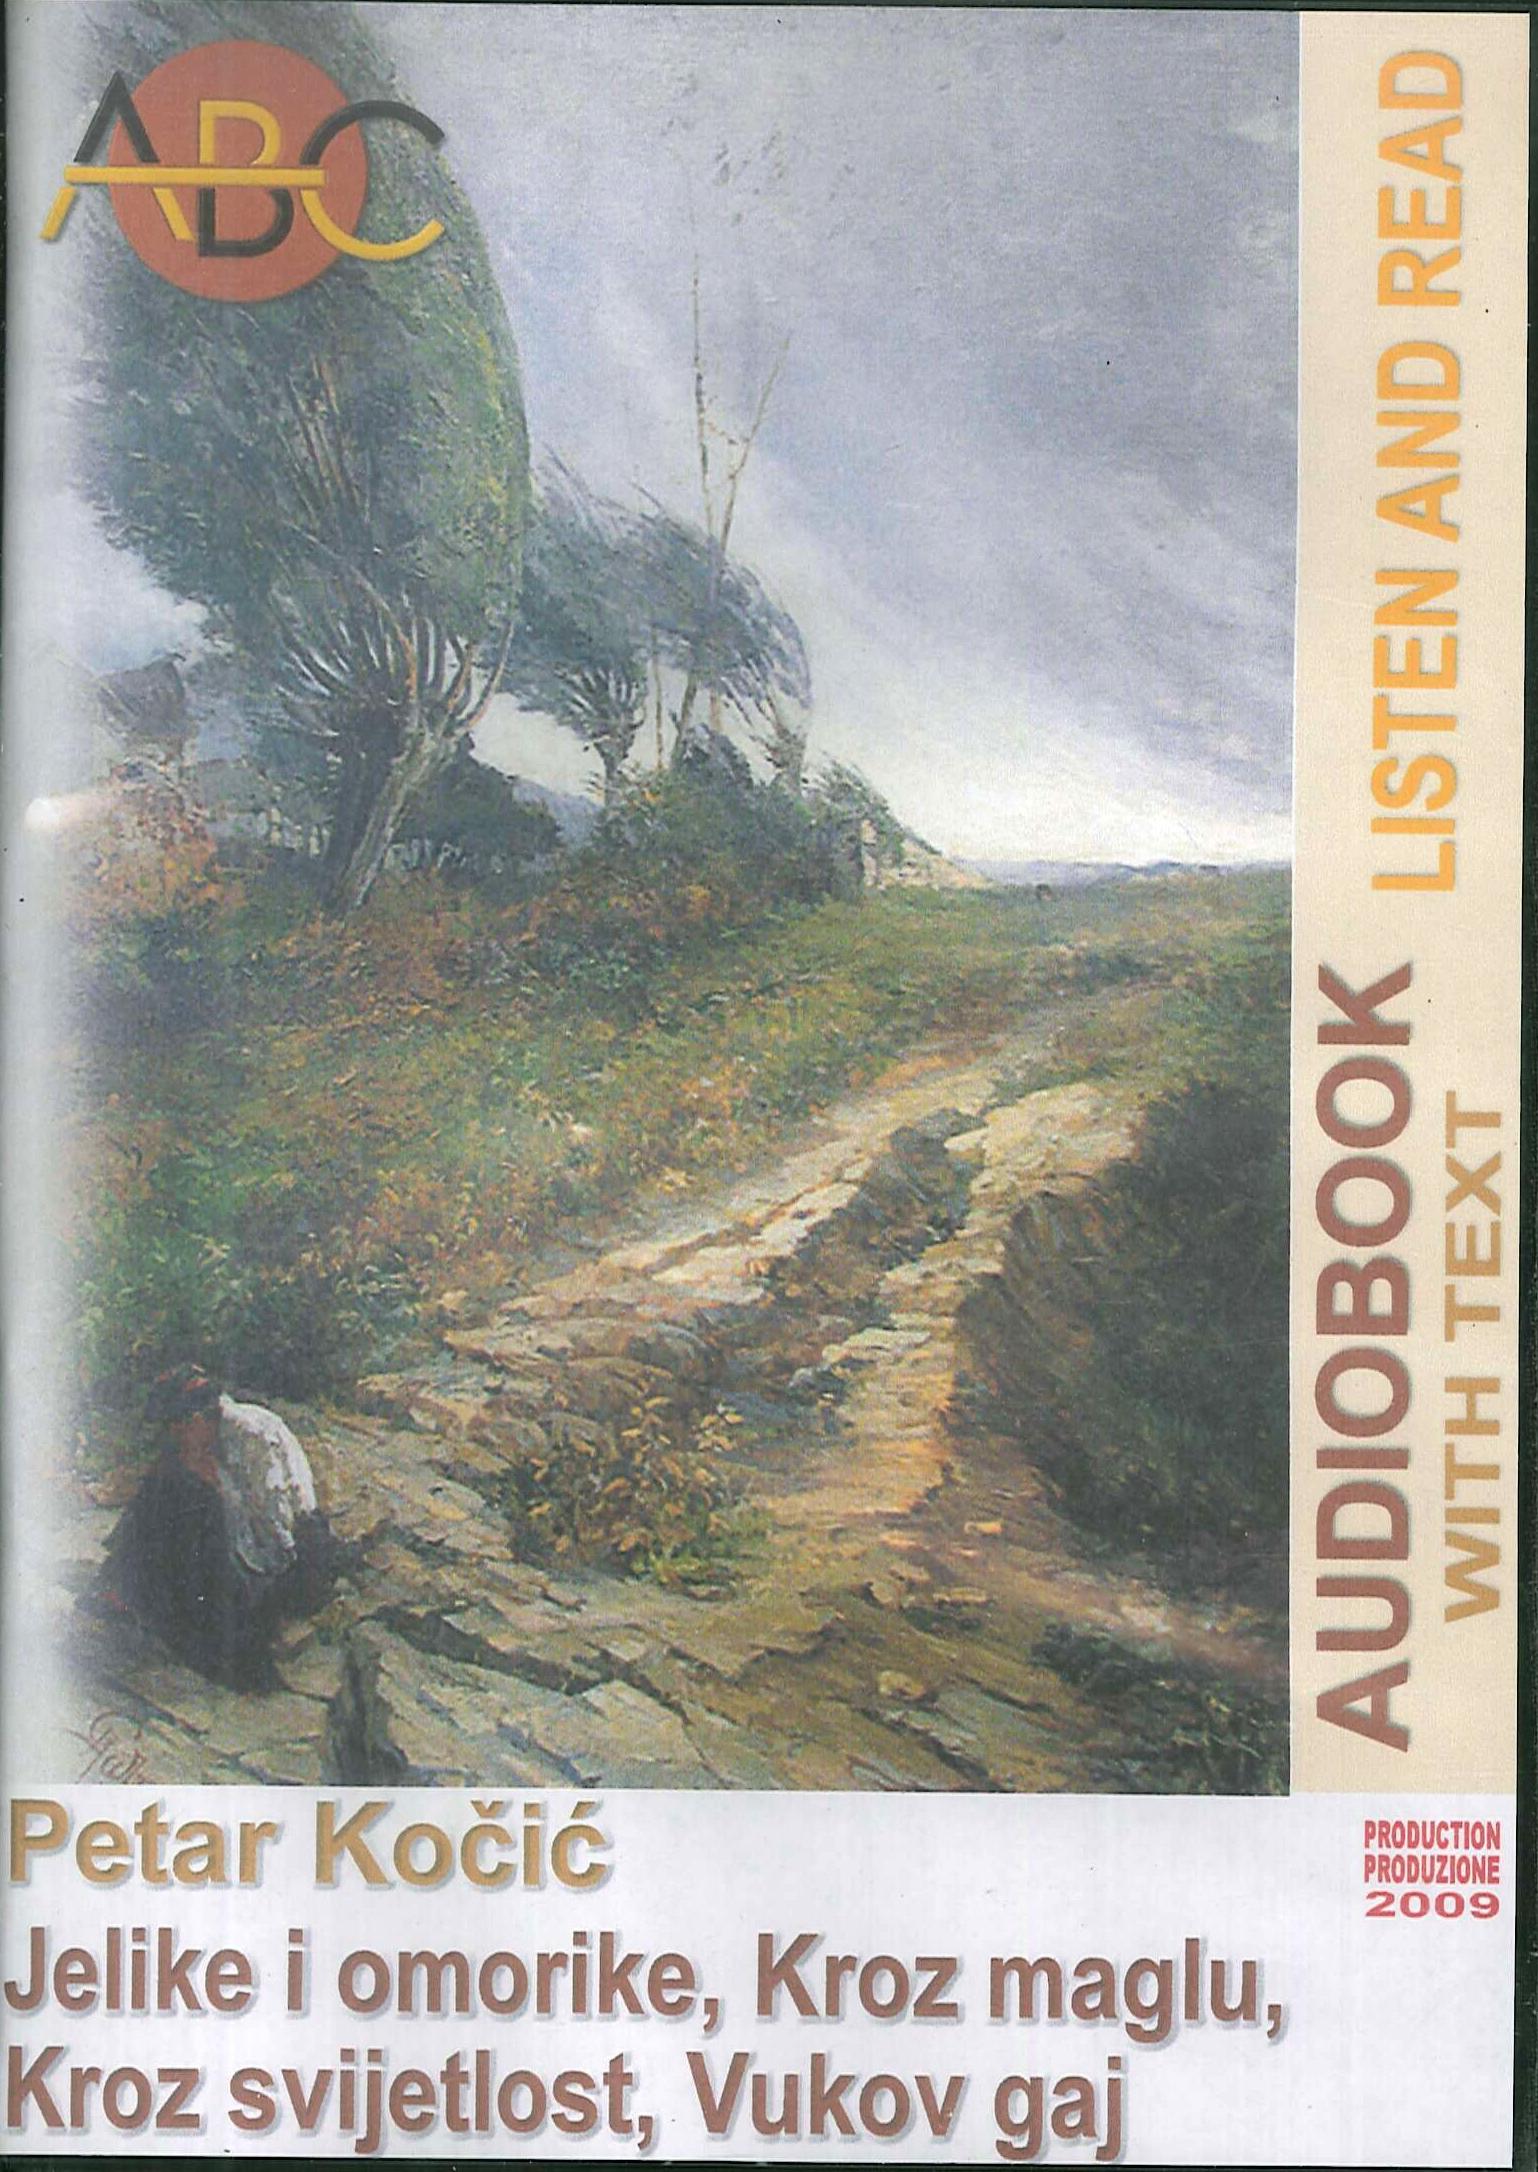 Jelike i omorike, kroz maglu, kroz svijetlost, vukos gaj. Audiolibro. CD Audio. Con CD-ROM. N.cat. 02/036